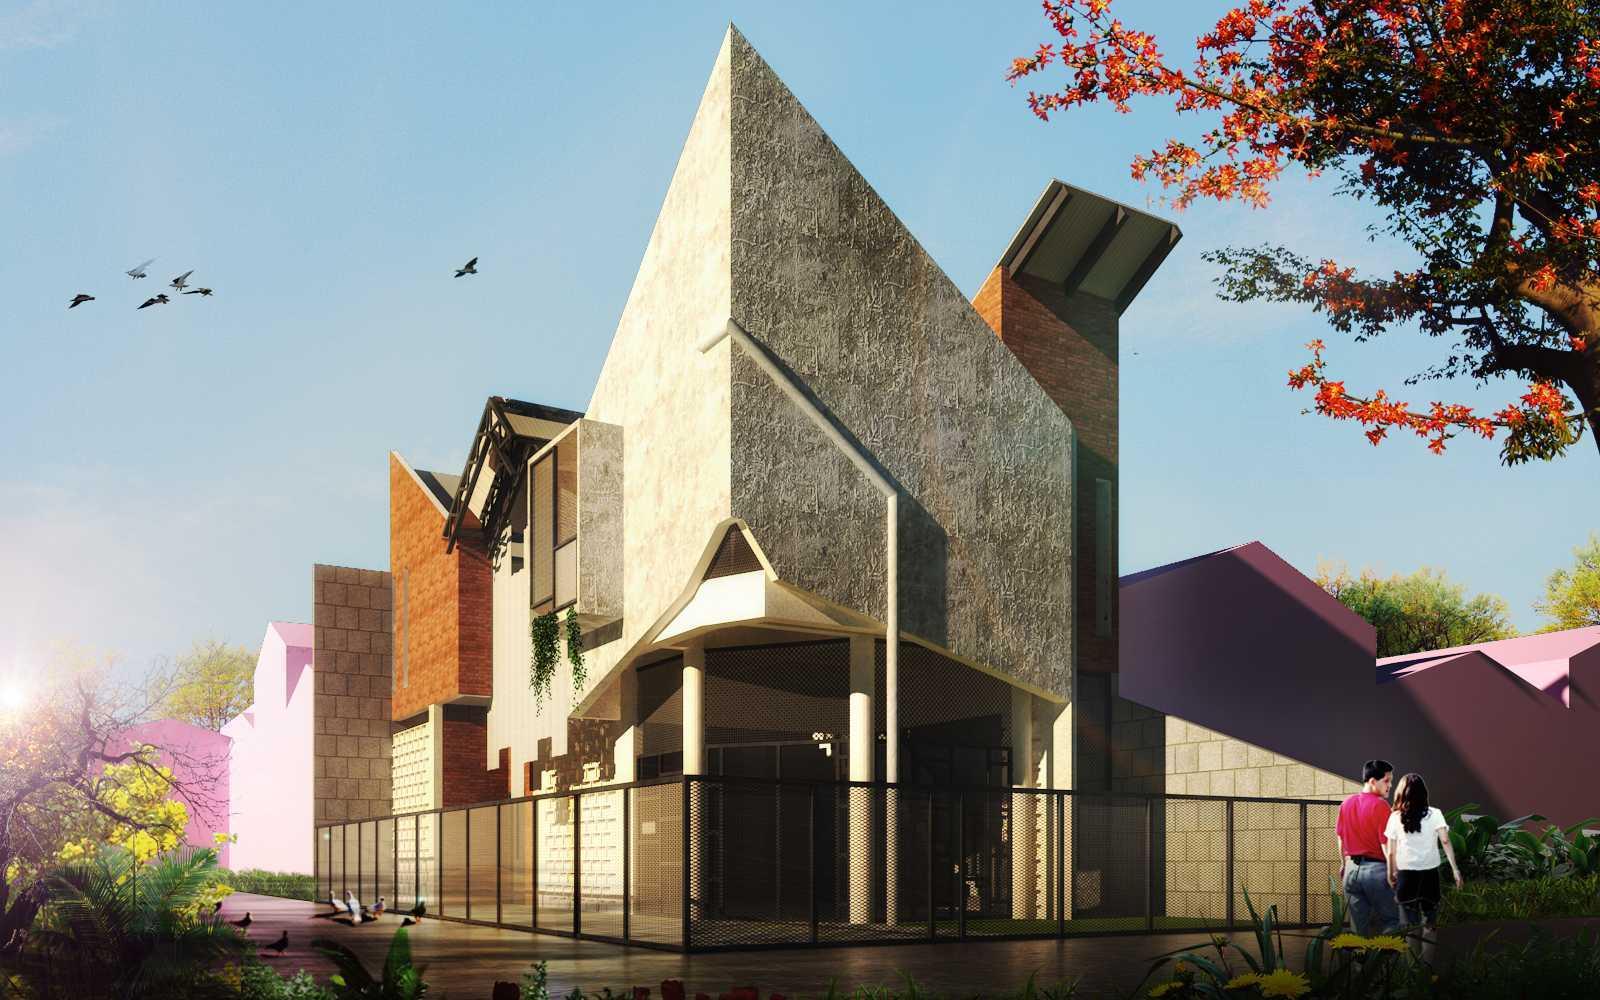 Indoneosian Architect Menjulang Tinggi Surabaya, Kota Sby, Jawa Timur, Indonesia Surabaya, Kota Sby, Jawa Timur, Indonesia Studioindoneosia-Menjulang-Tinggi  60945